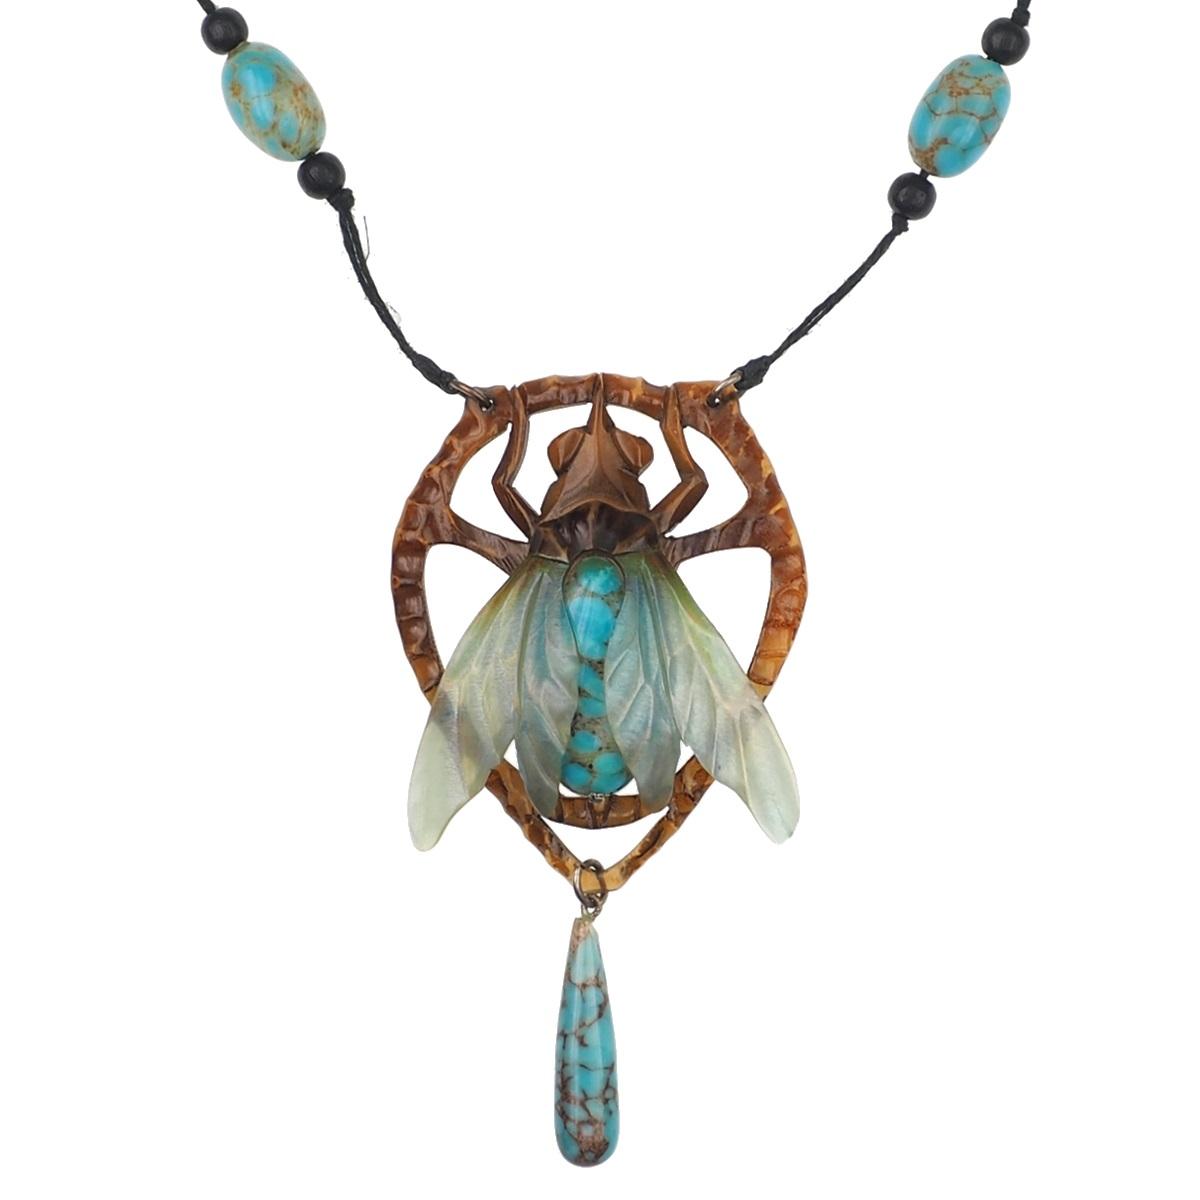 Horncollier Elizabeth Bonte Antique Jewellery Berlin